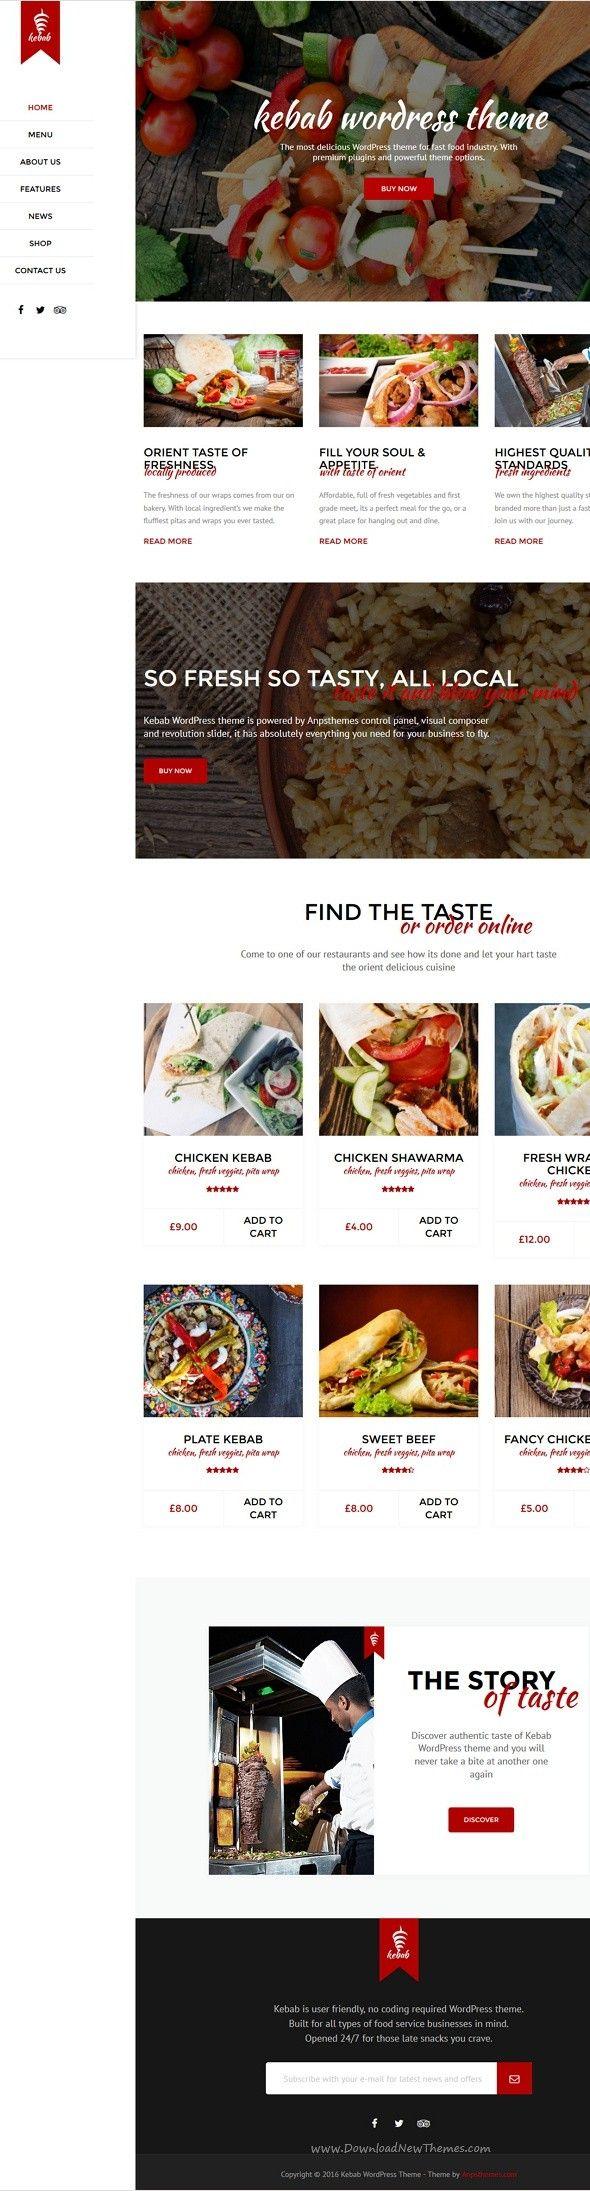 Kebab Restaurant Fast Food Wordpress Theme